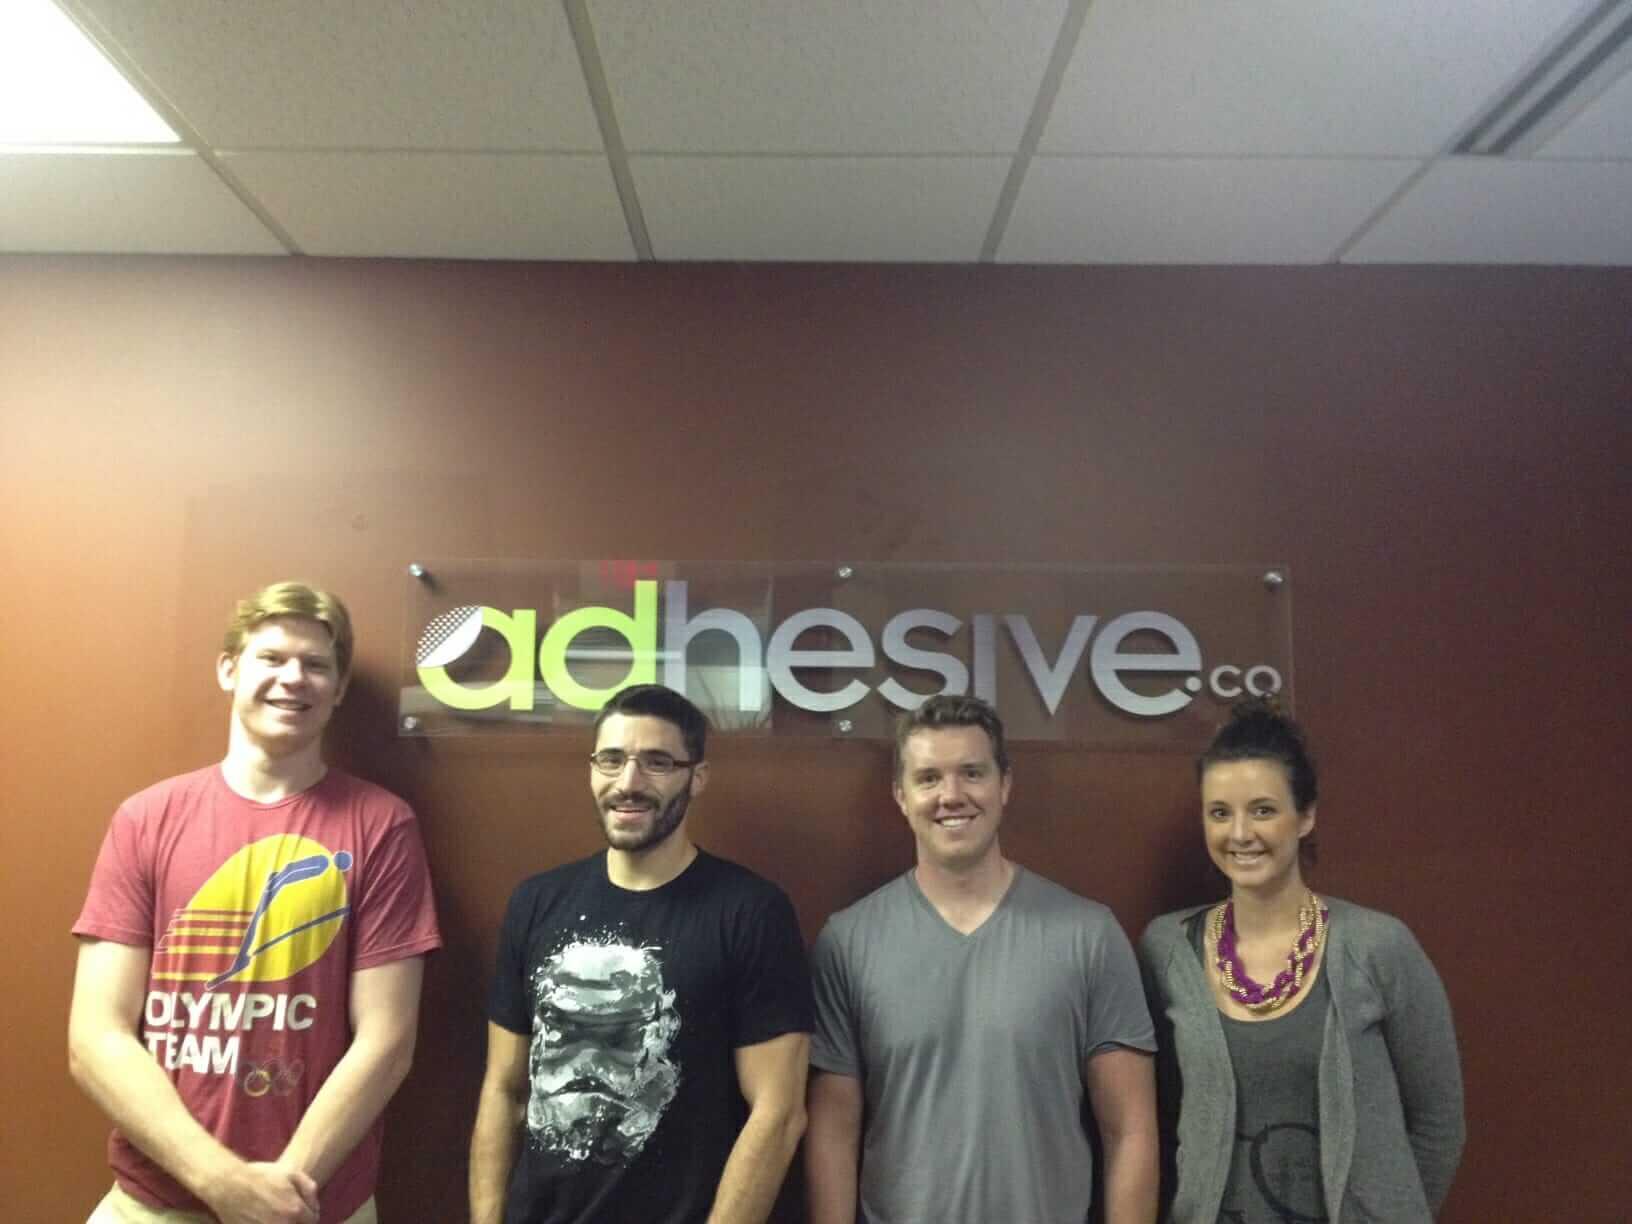 4 newbies started adhesive sales team